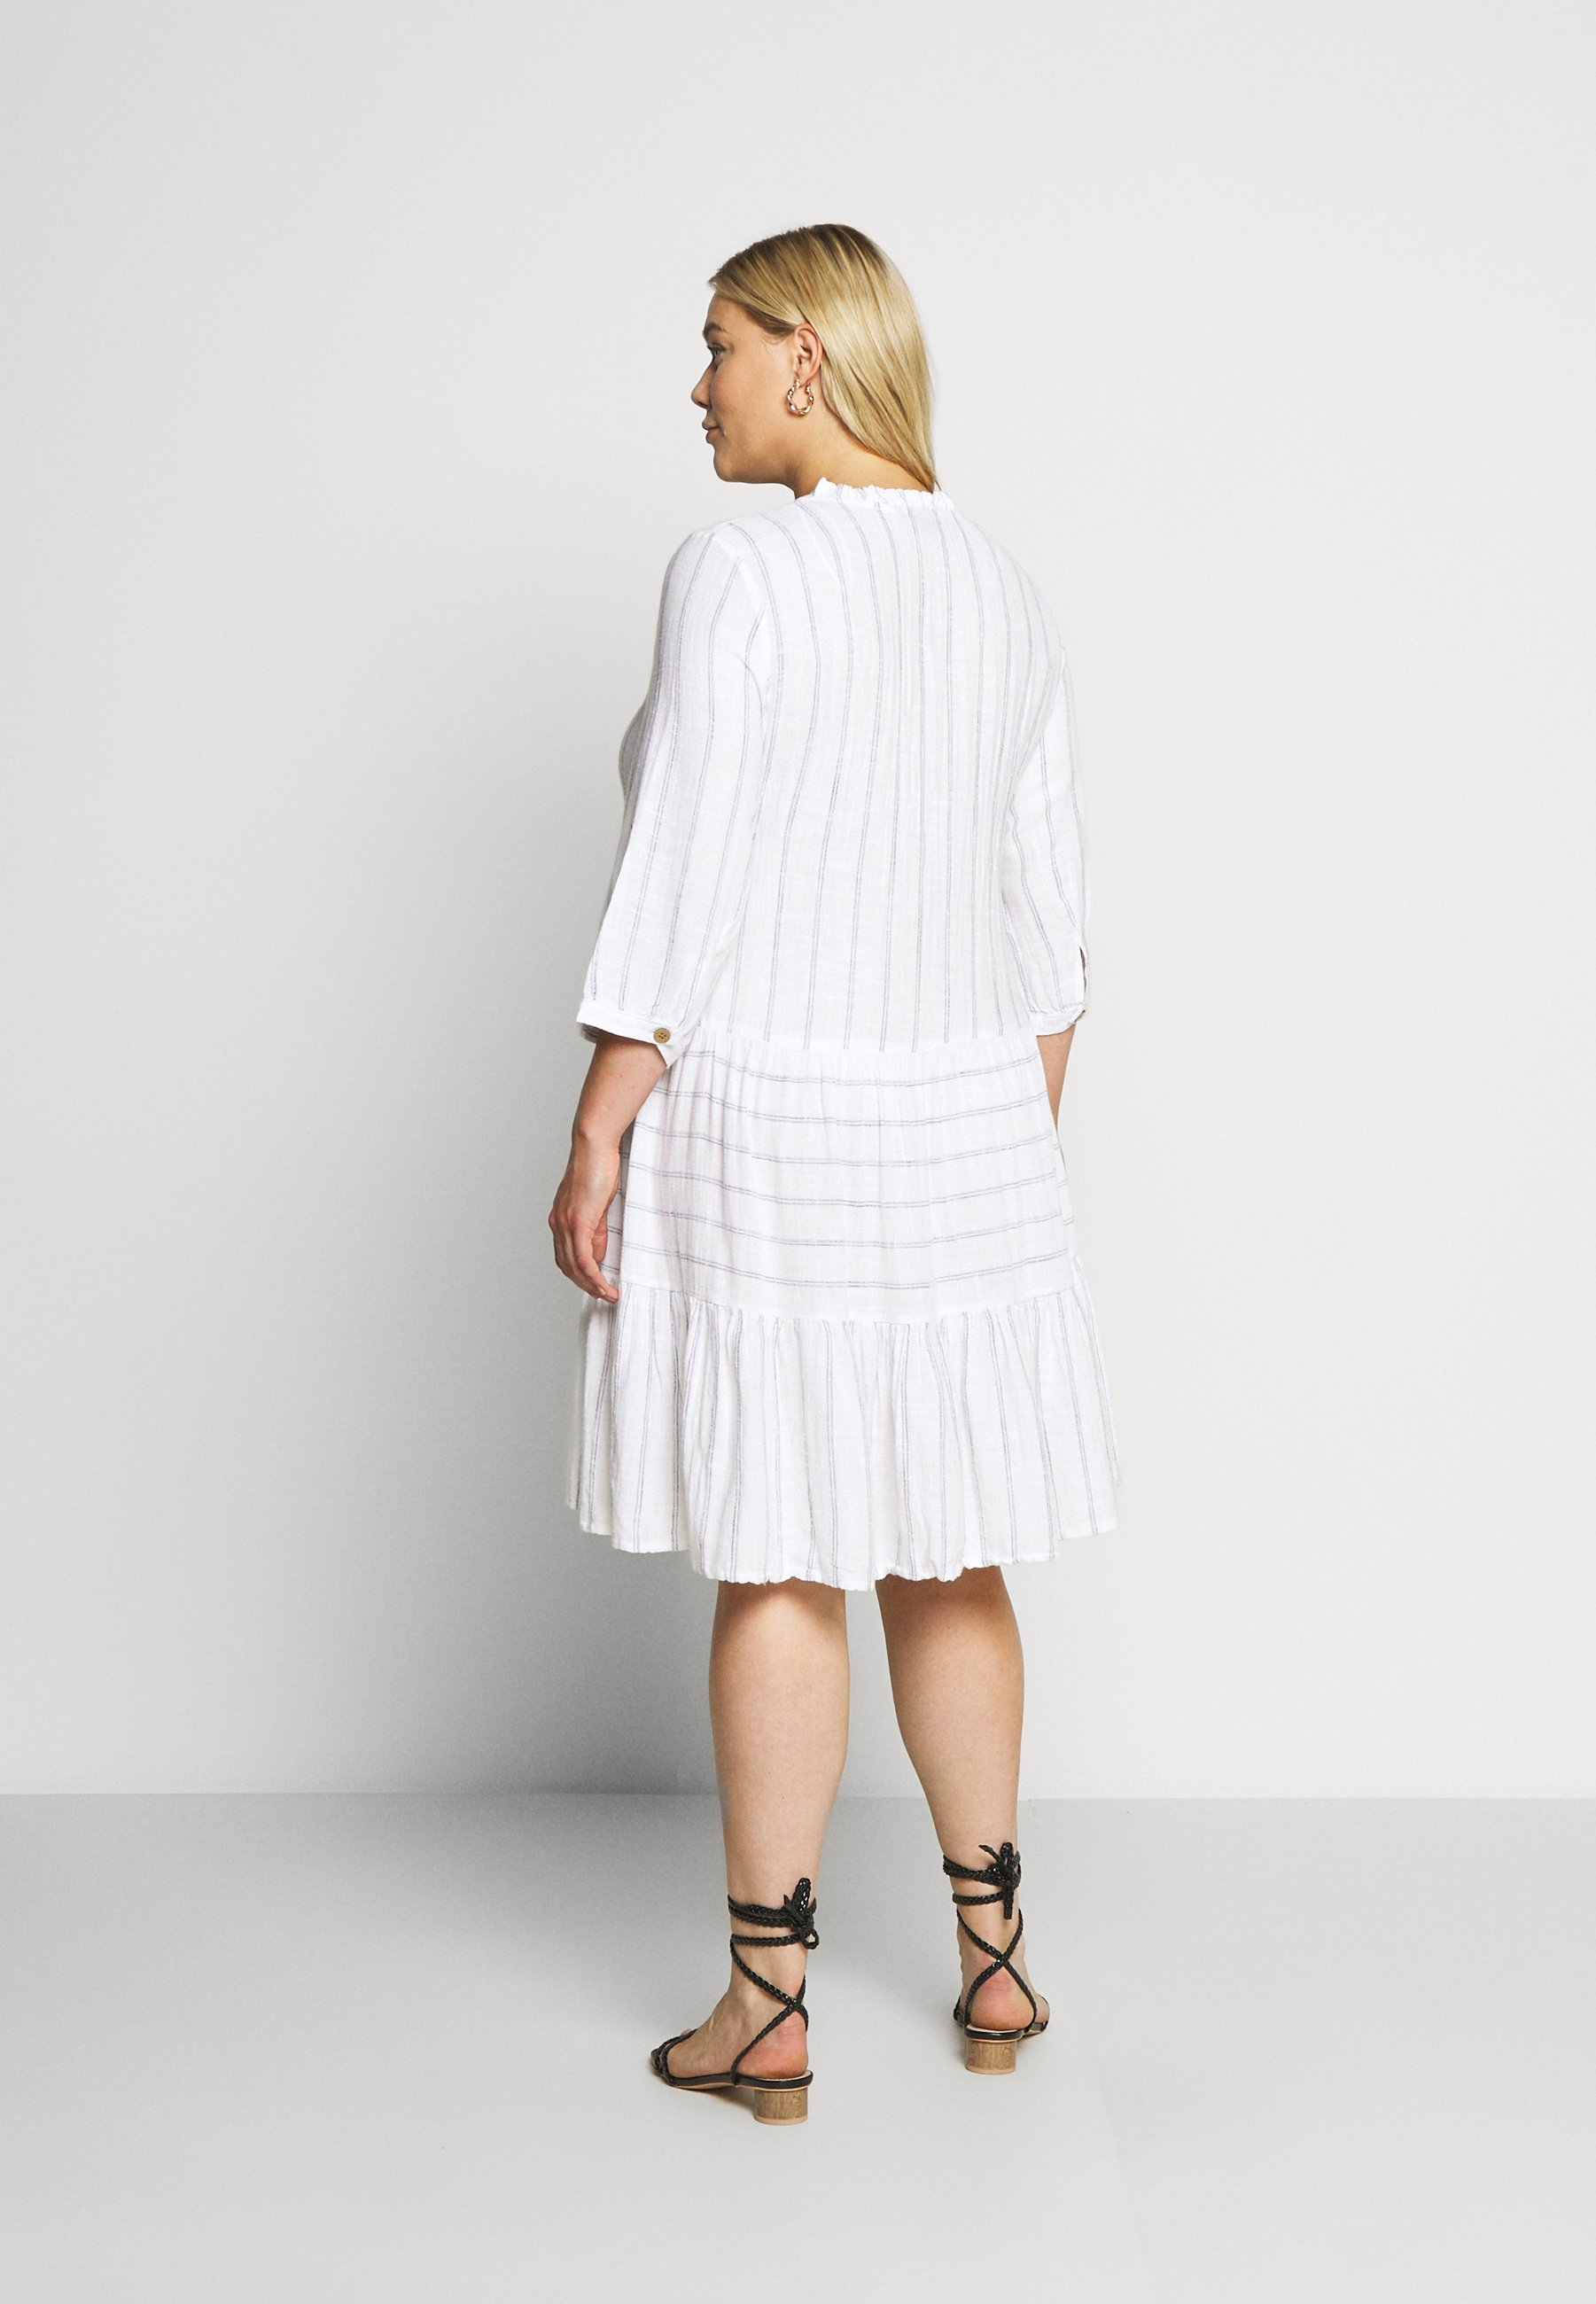 Zizzi MCATA - Day dress - white - Women's Clothing 5PV1i